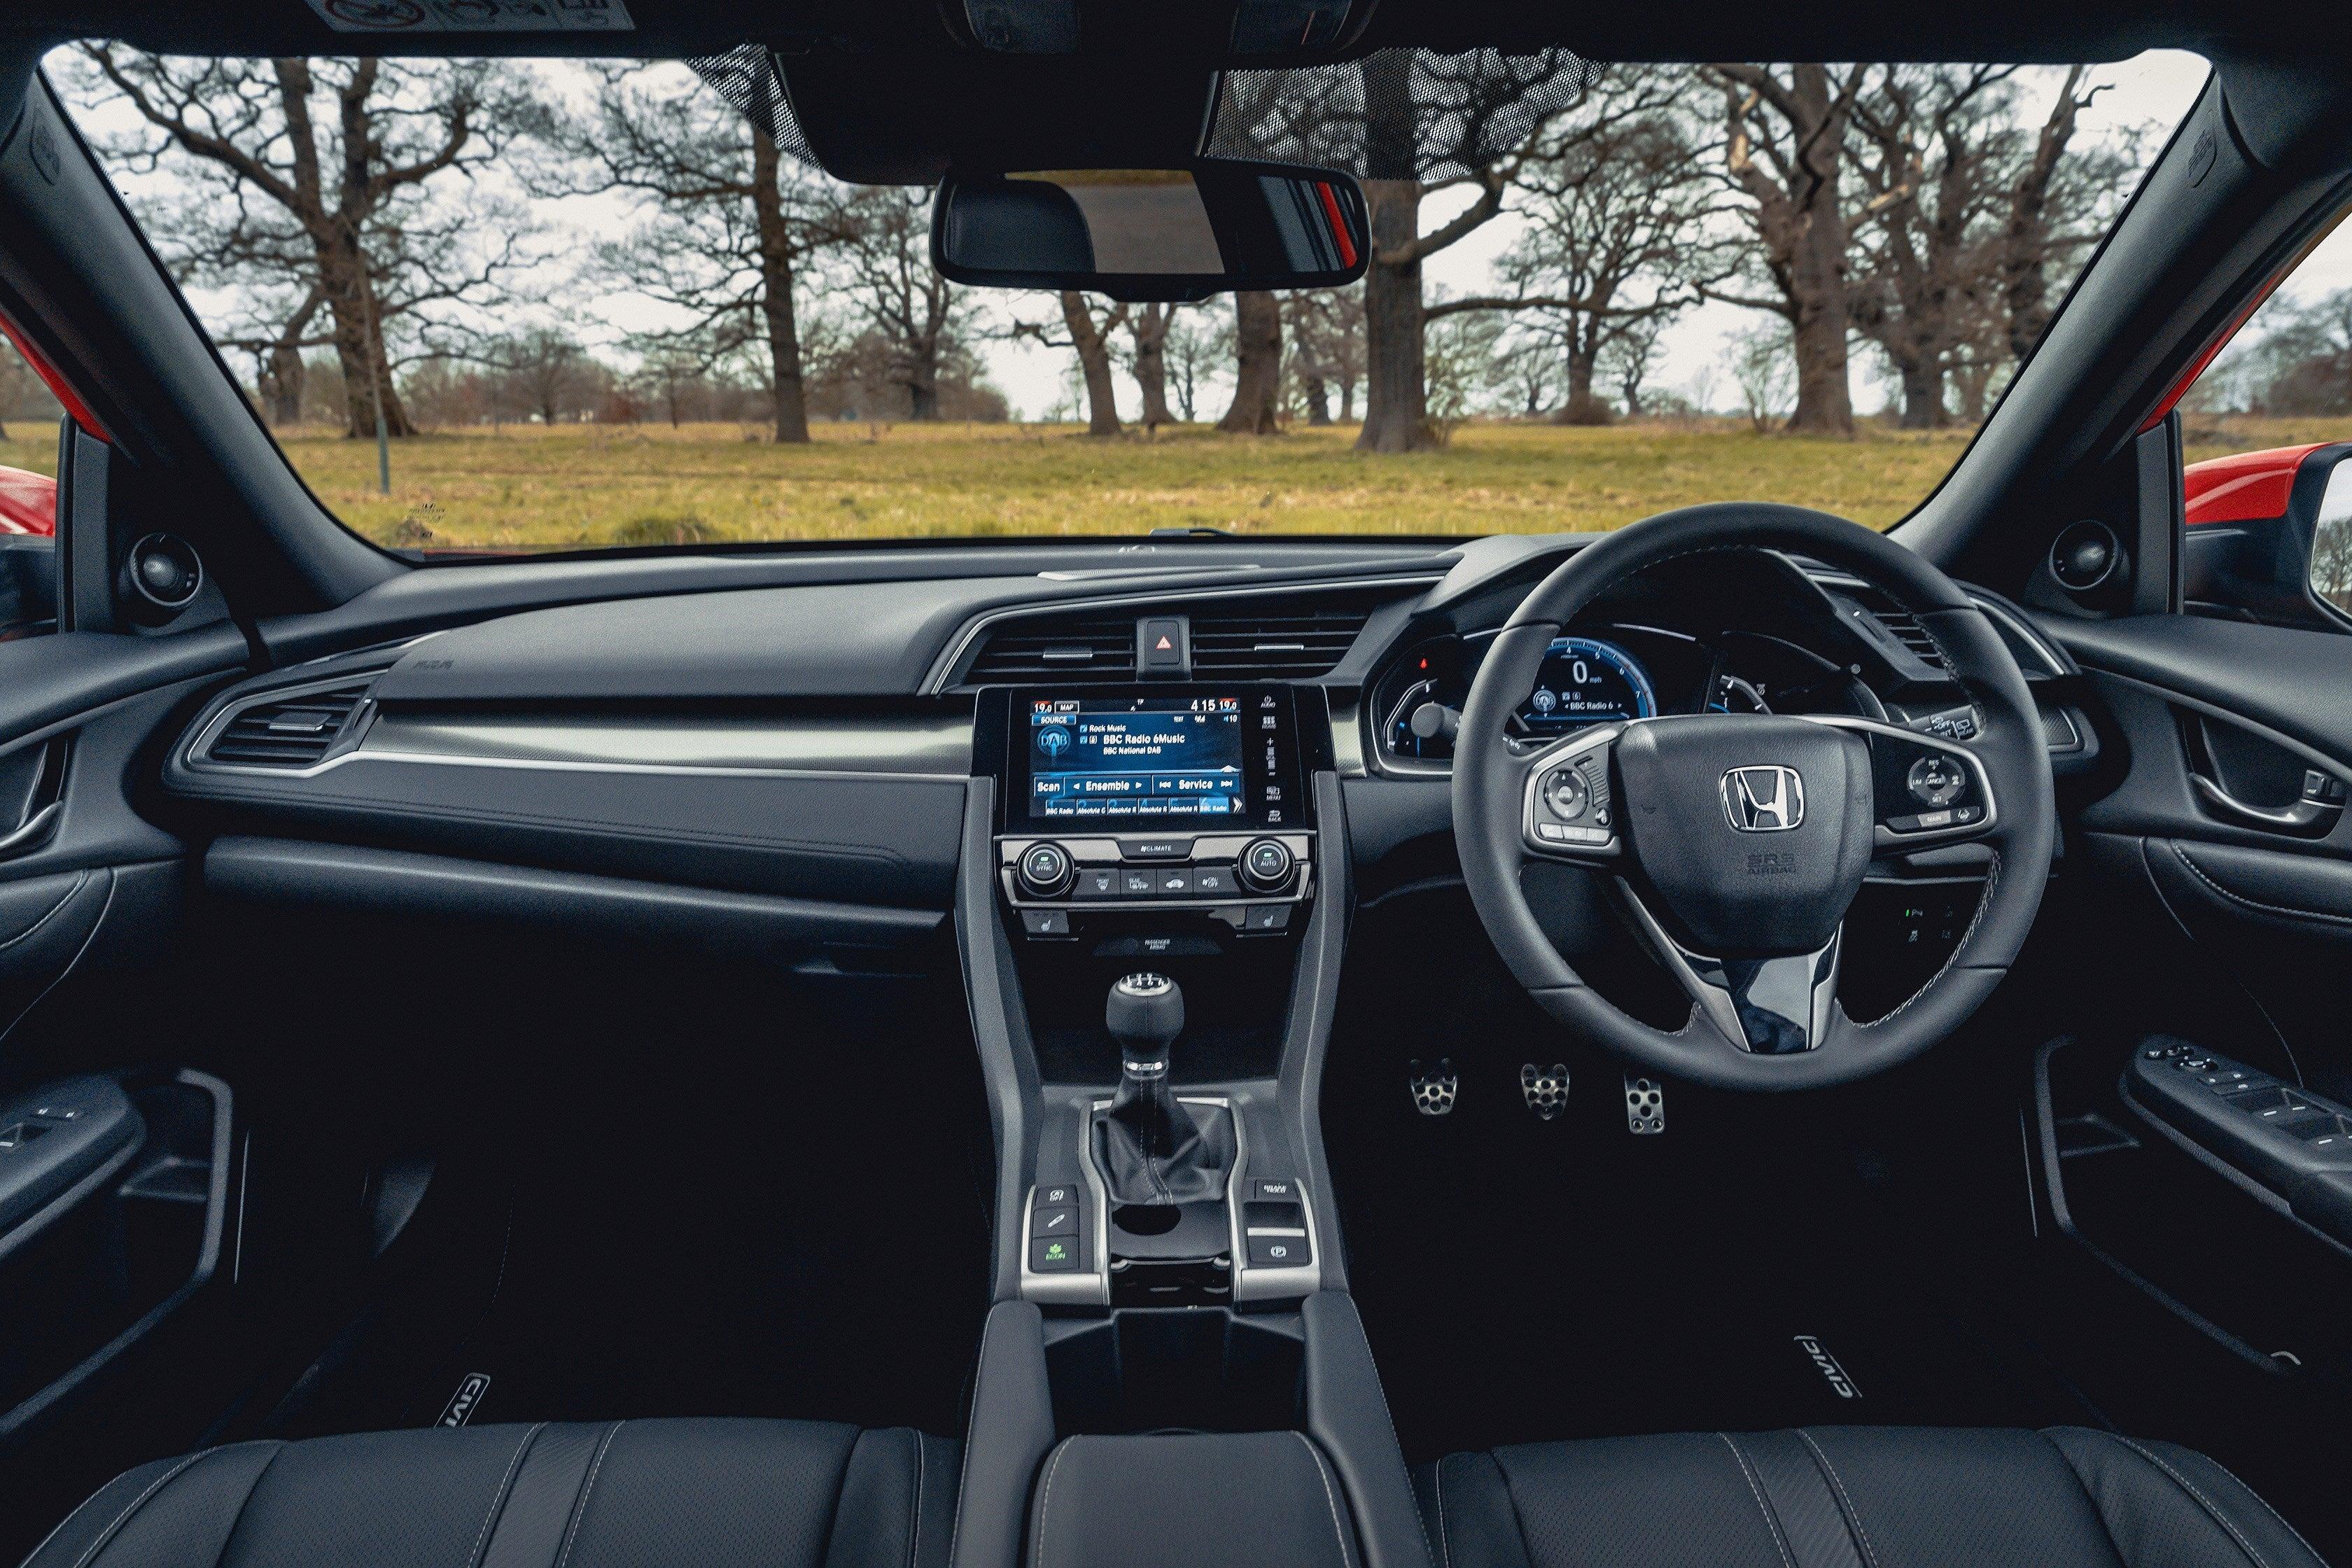 Honda Civic front interior